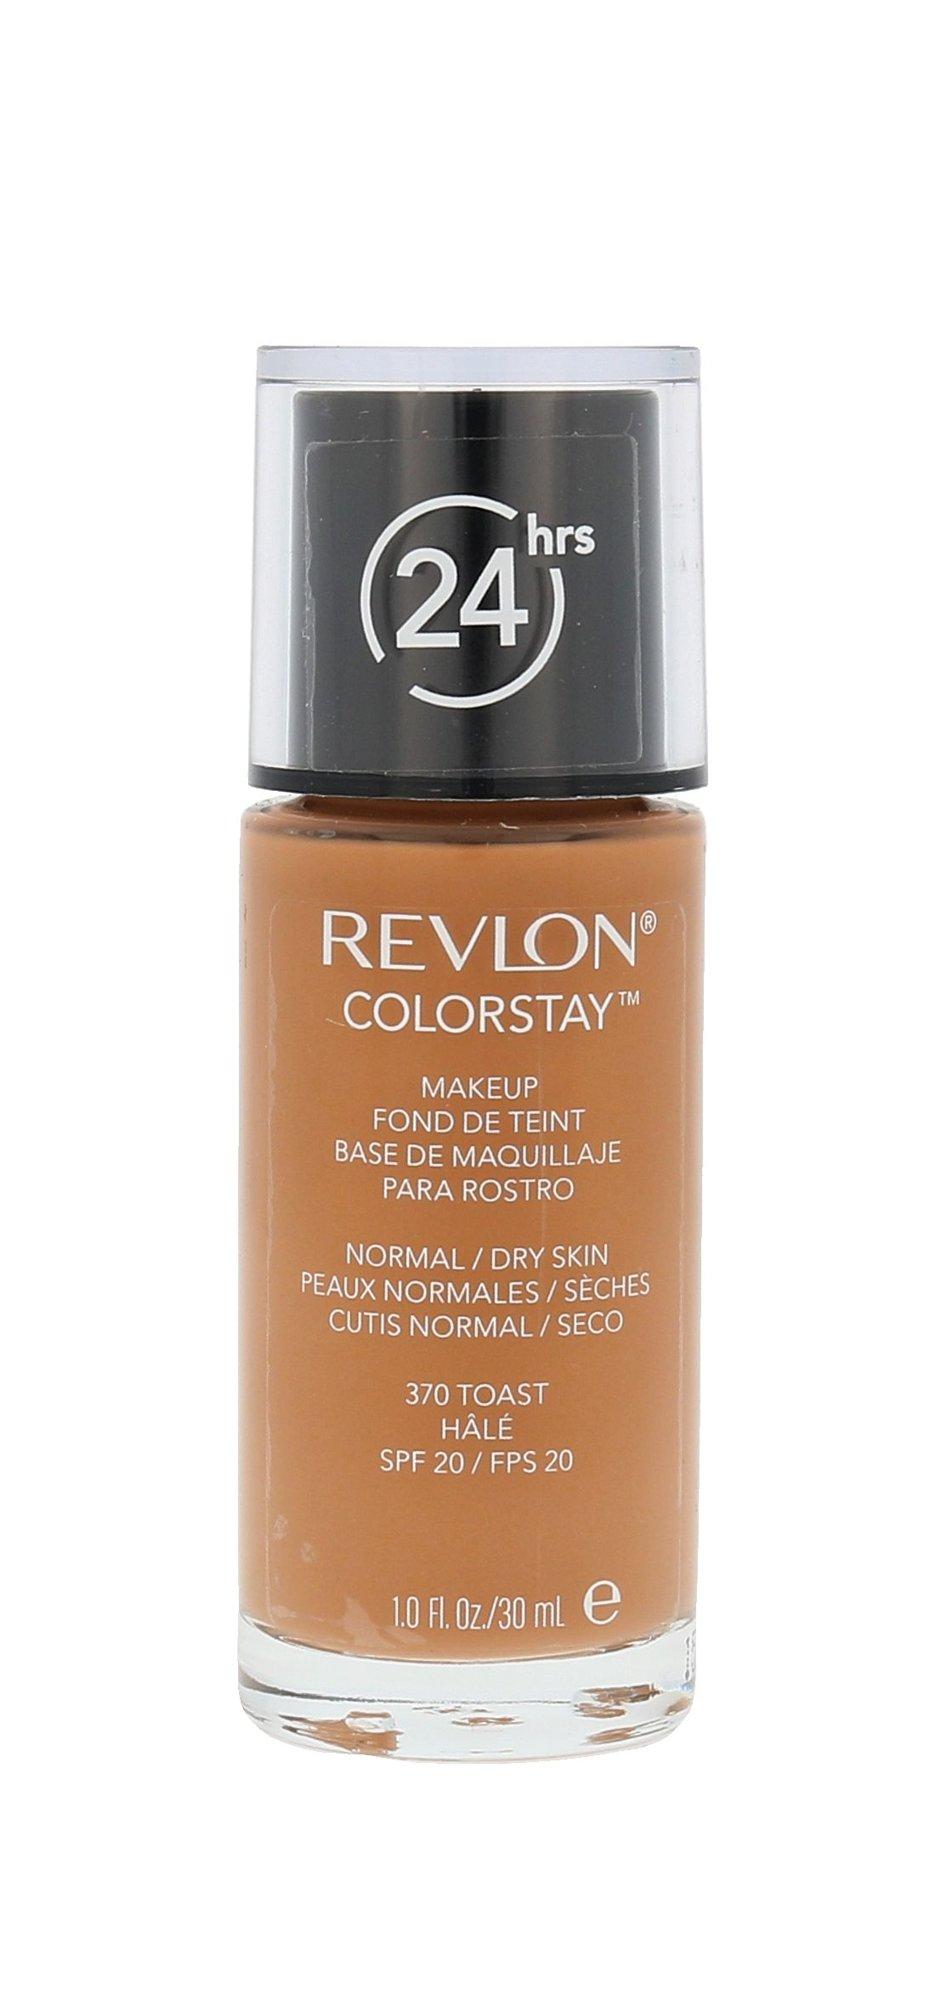 Revlon Colorstay Cosmetic 30ml 370 Toast